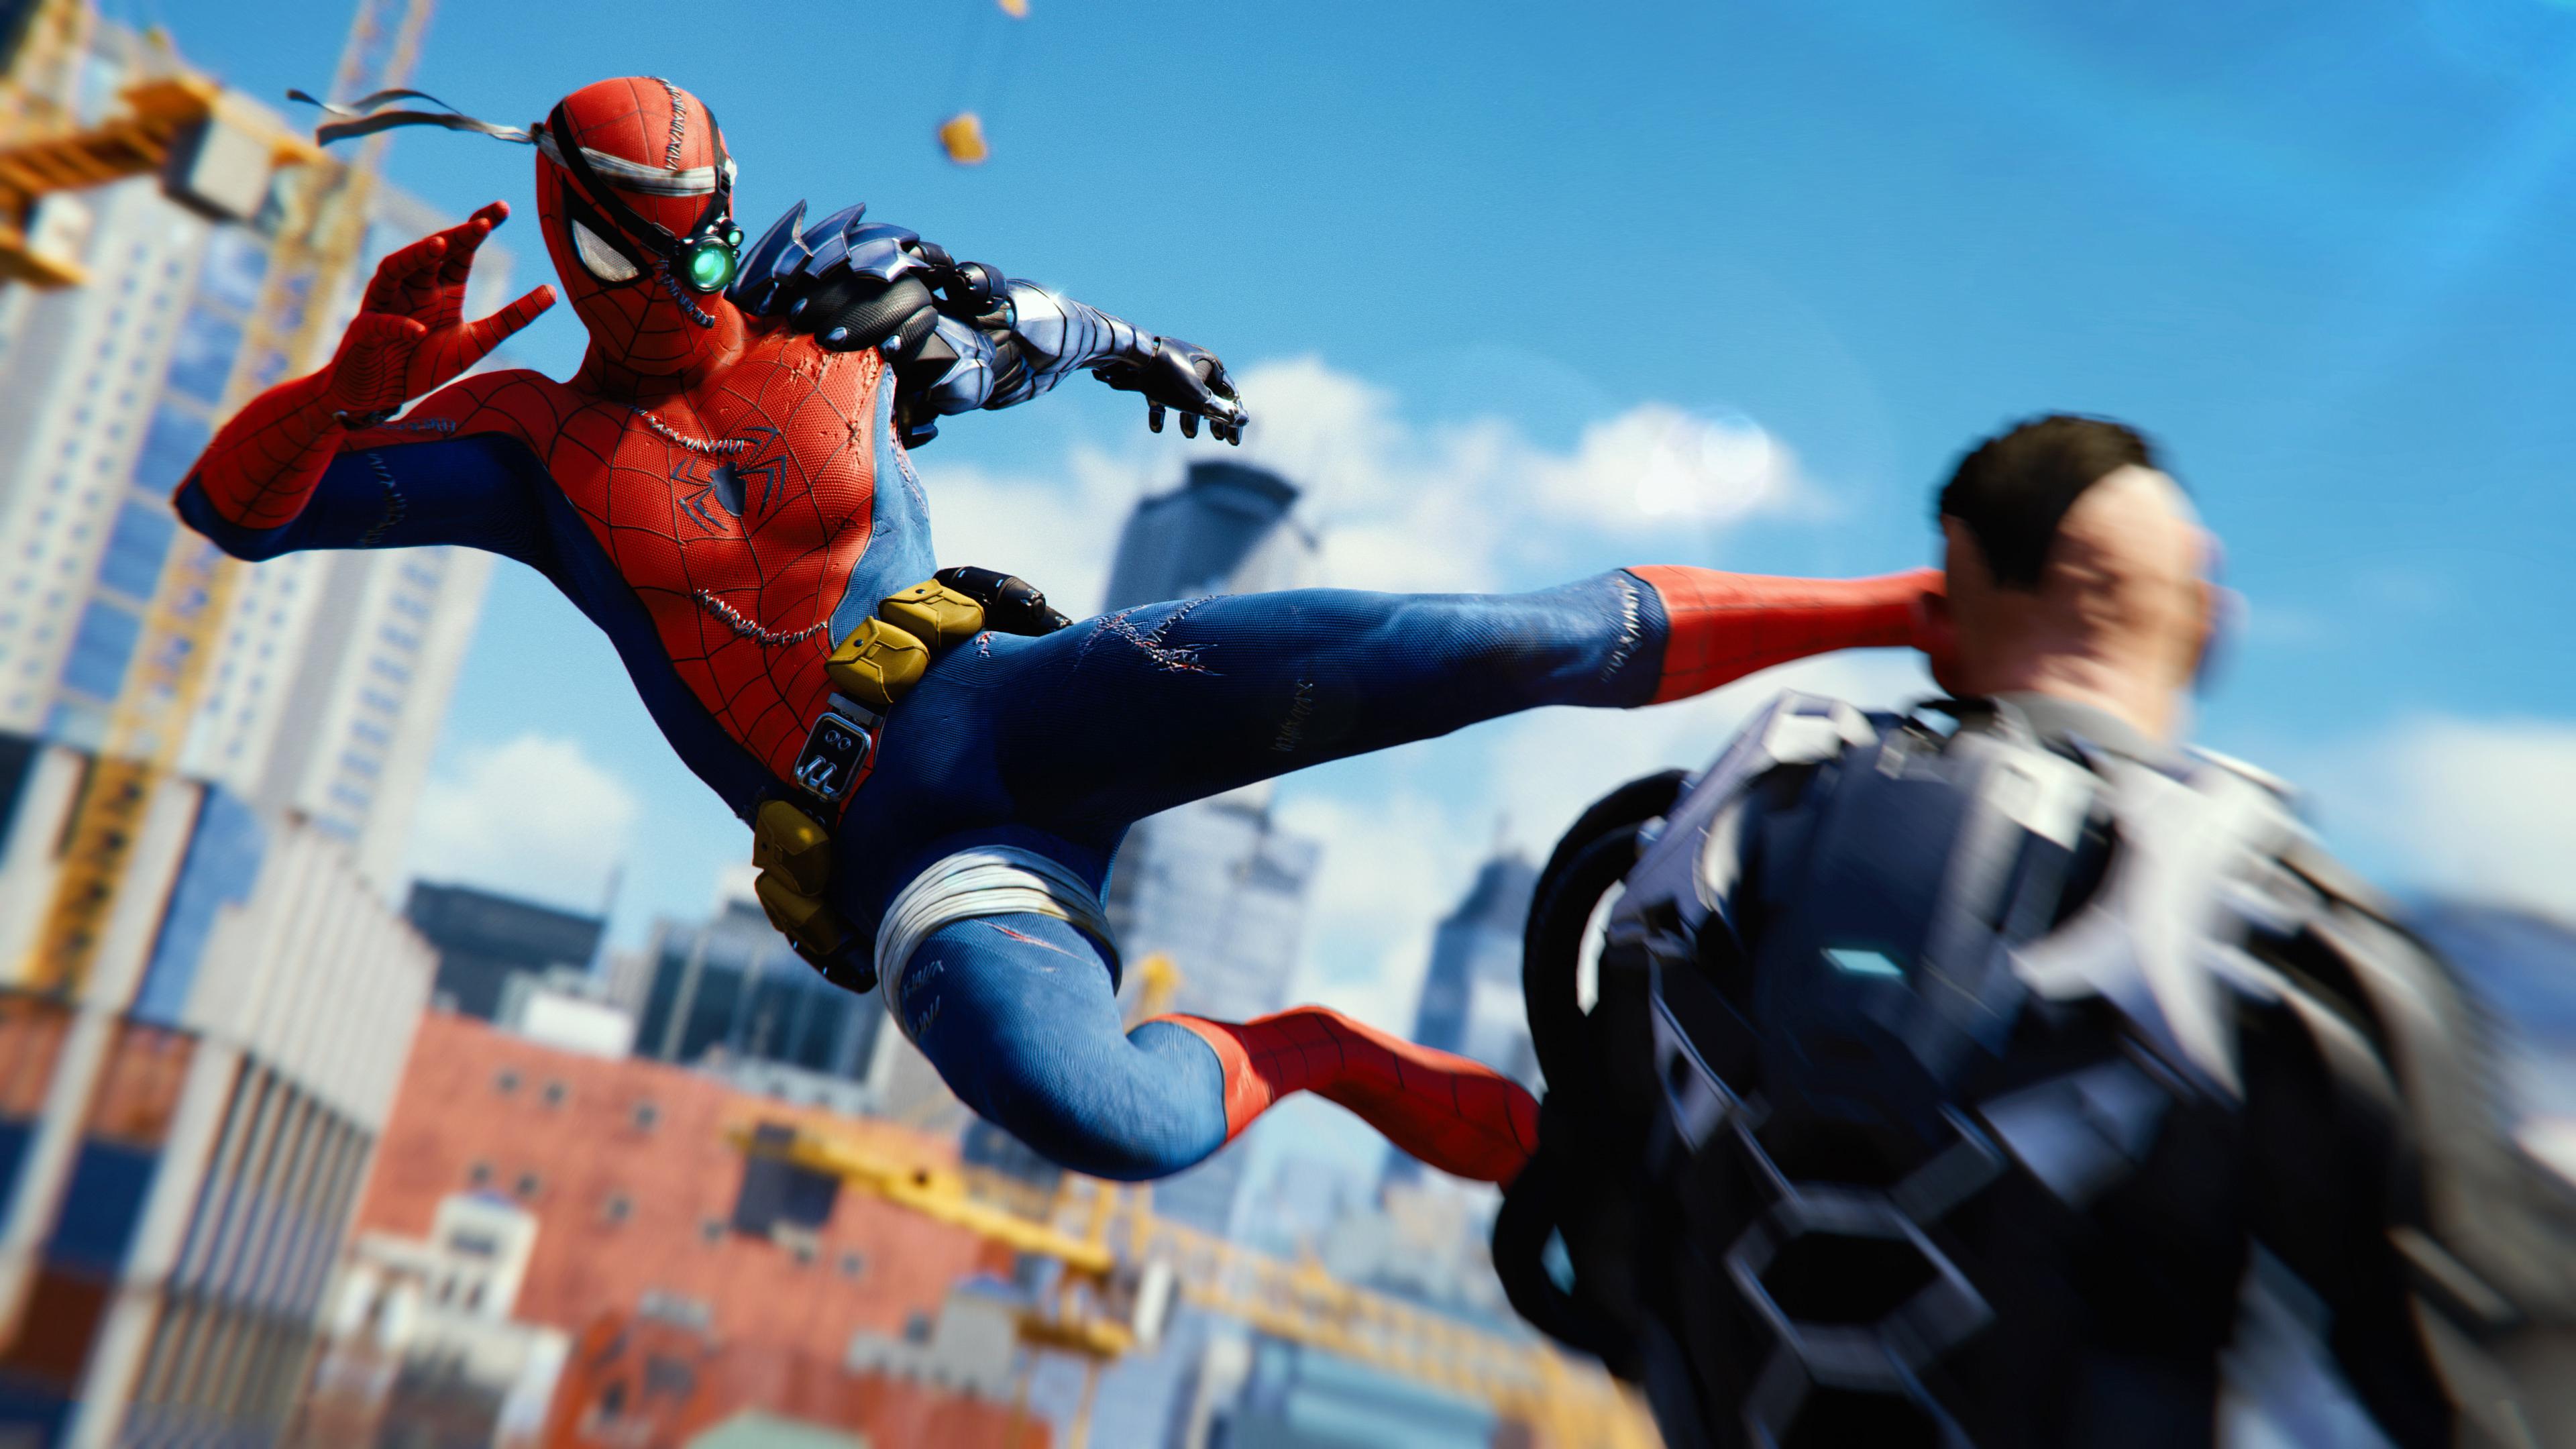 2880x1800 Spiderman Ps4 Attack 4k Macbook Pro Retina HD 4k